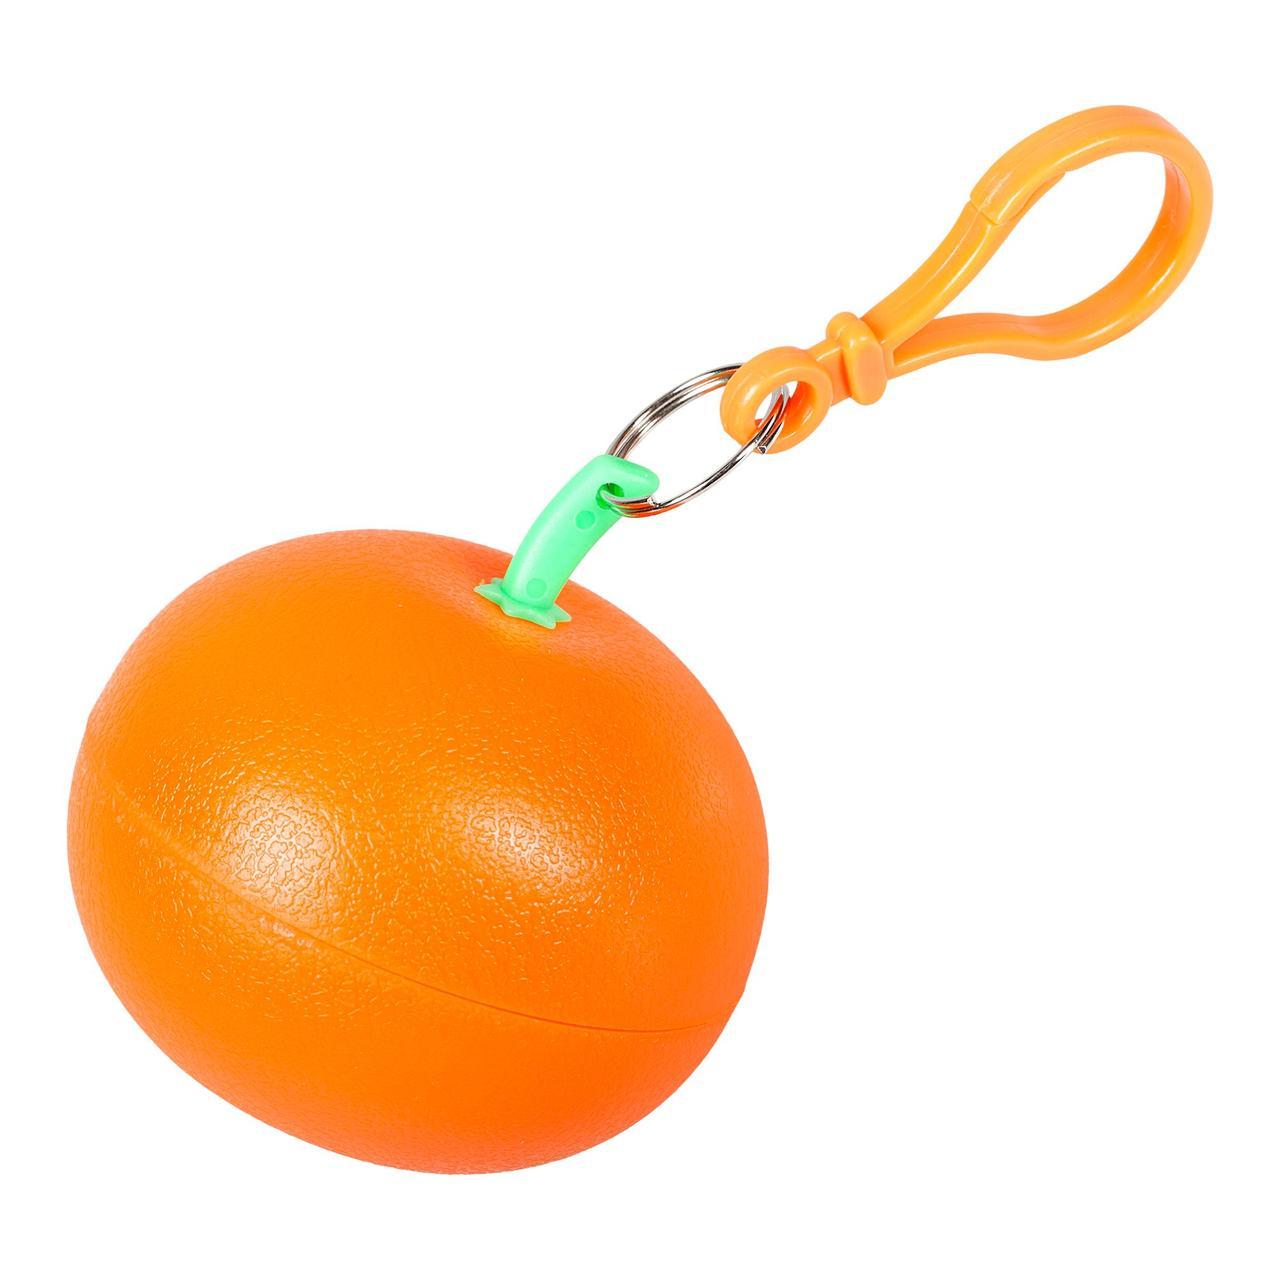 Дождевик в футляре «Фрукт», оранжевый мандарин (артикул 3708.20)